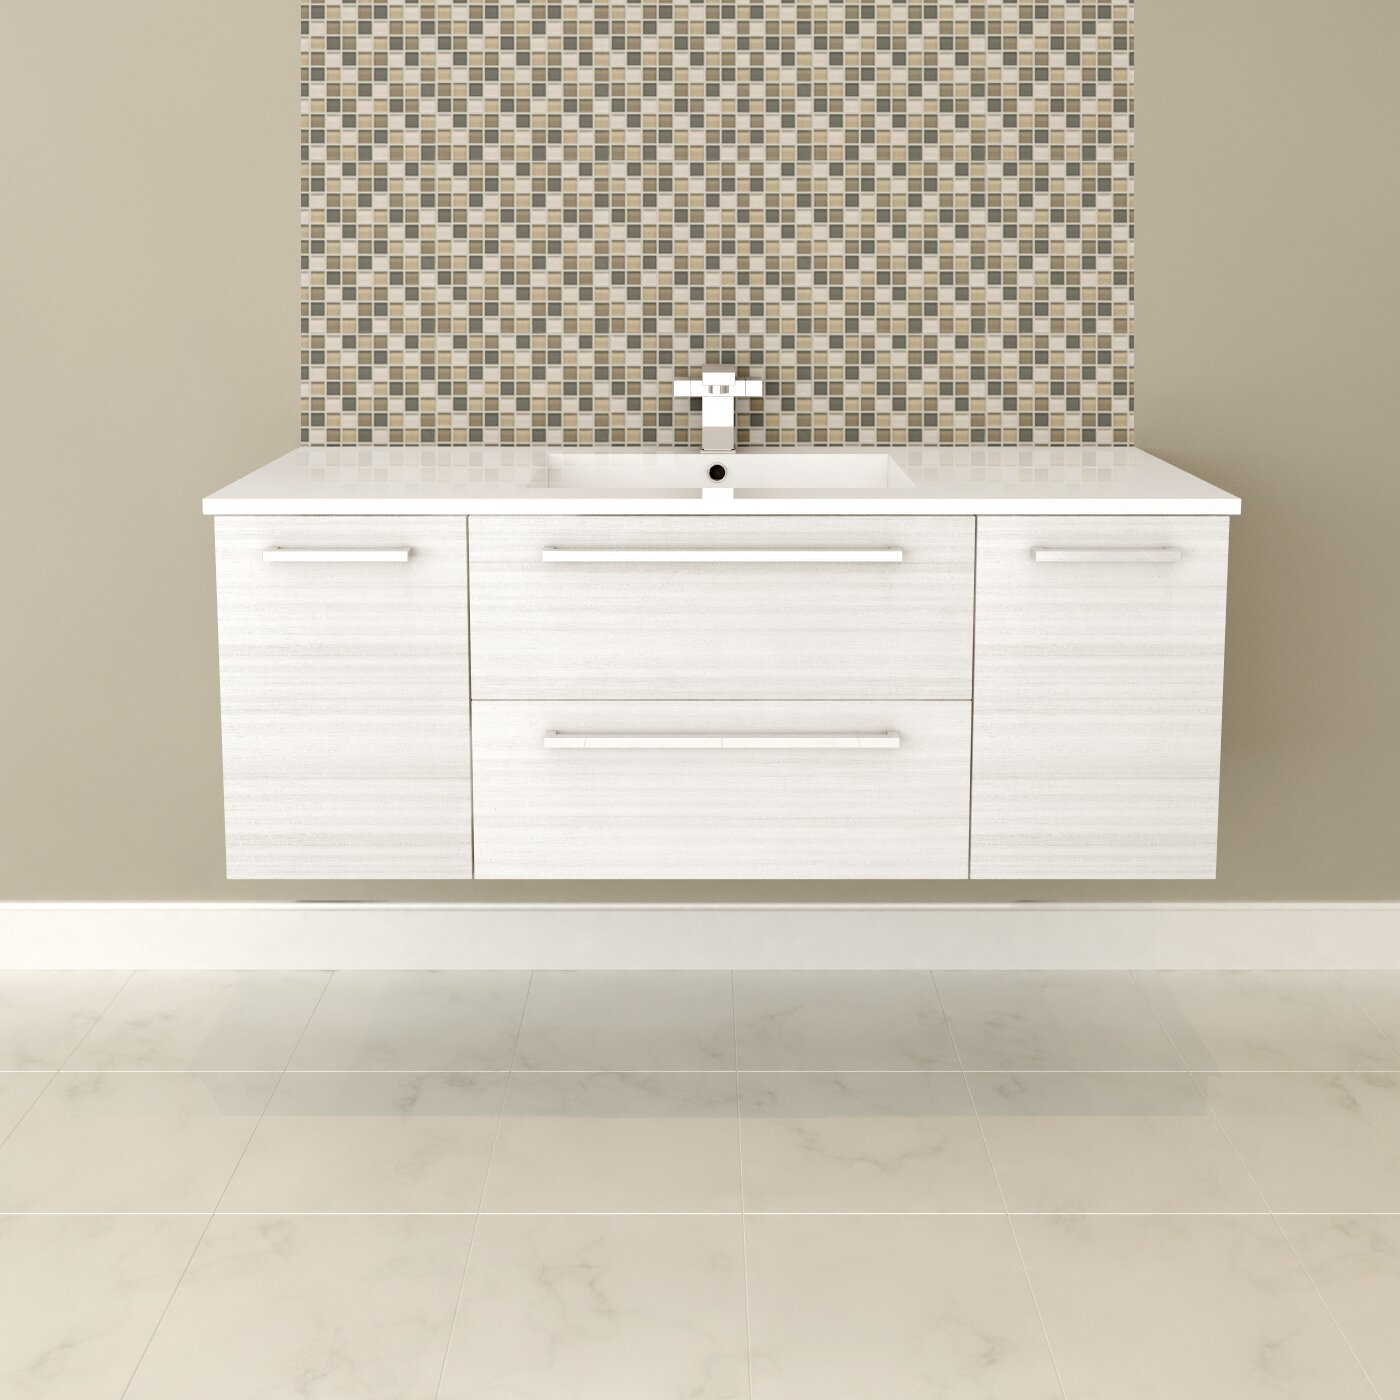 "Cutler Kitchen & Bath Silhouette 48"" Single Bathroom"